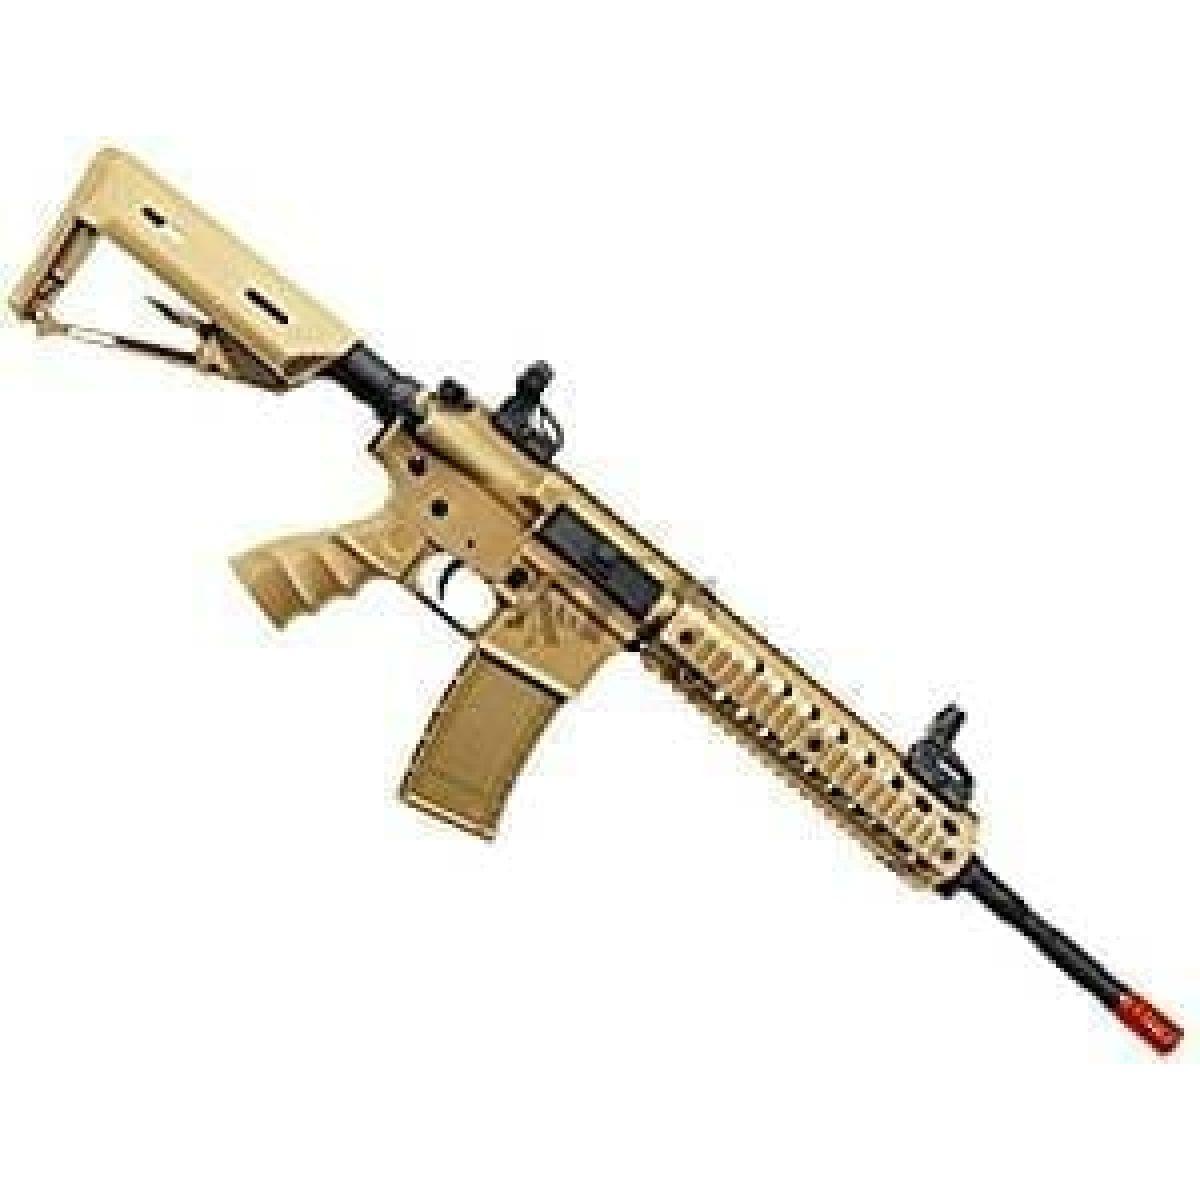 ARMY TAN Pro airsoft rifle metal